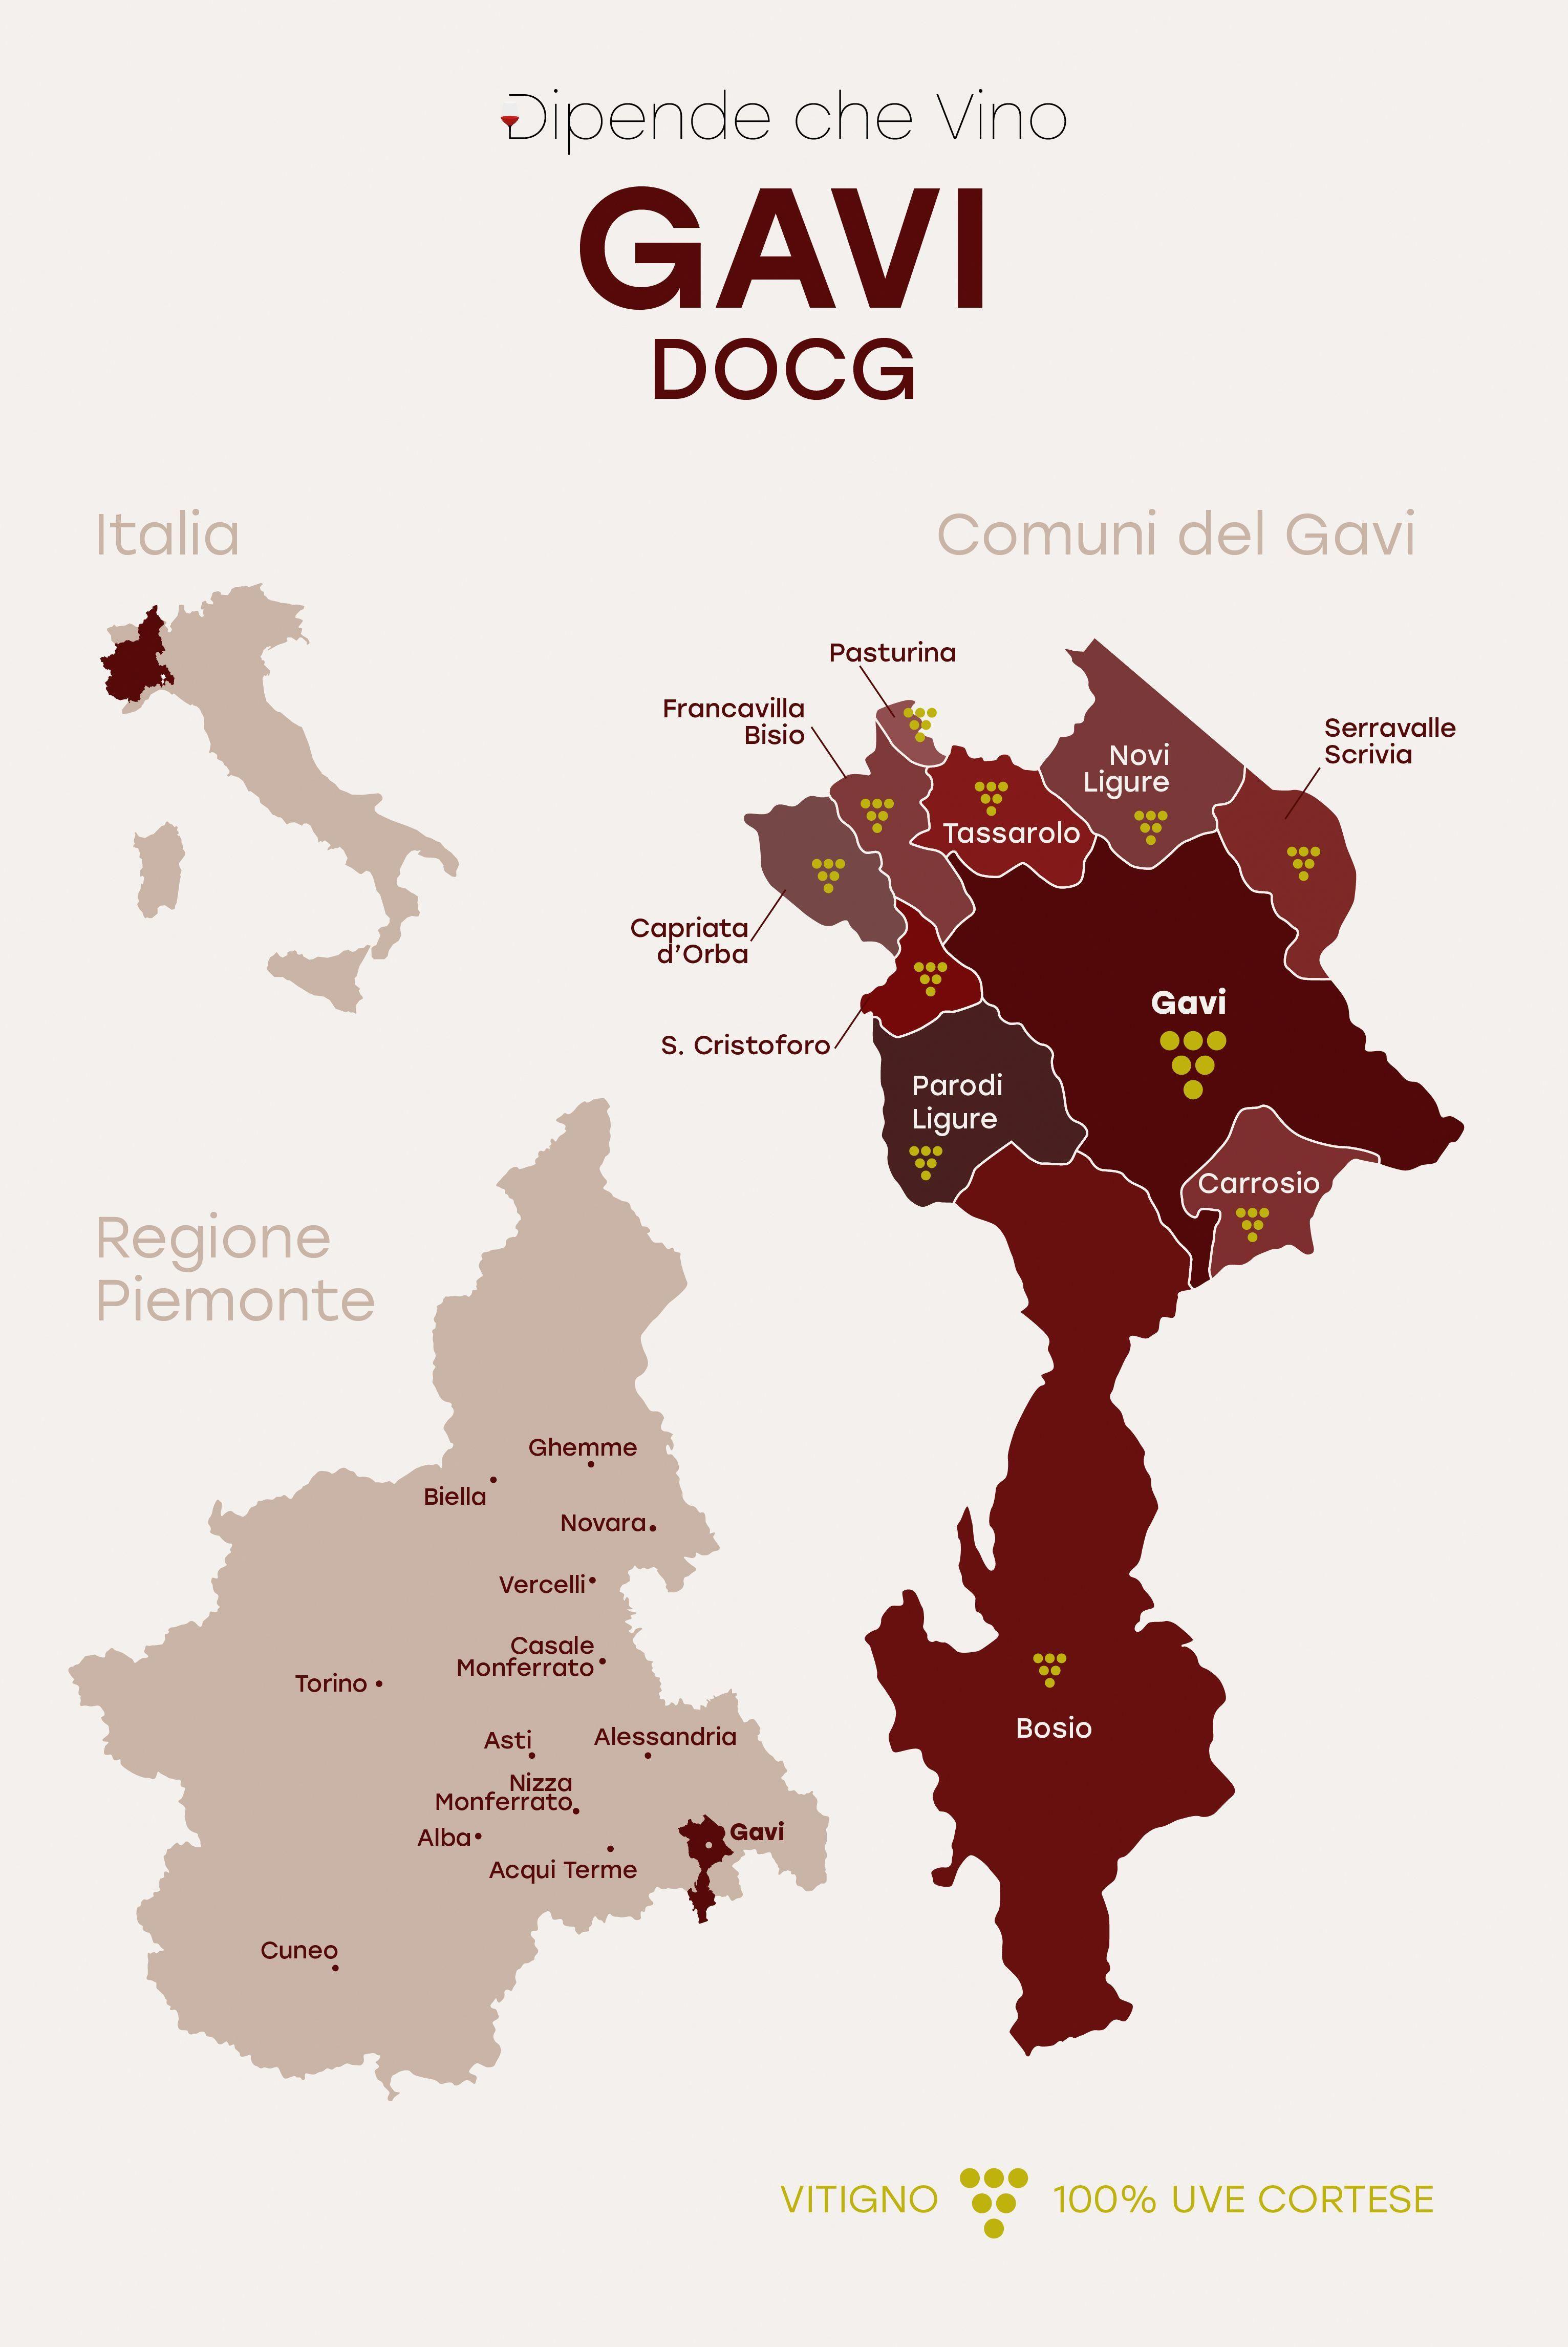 Wine Preservation System In 2020 Wine Map Italian Wine Wine Preserver